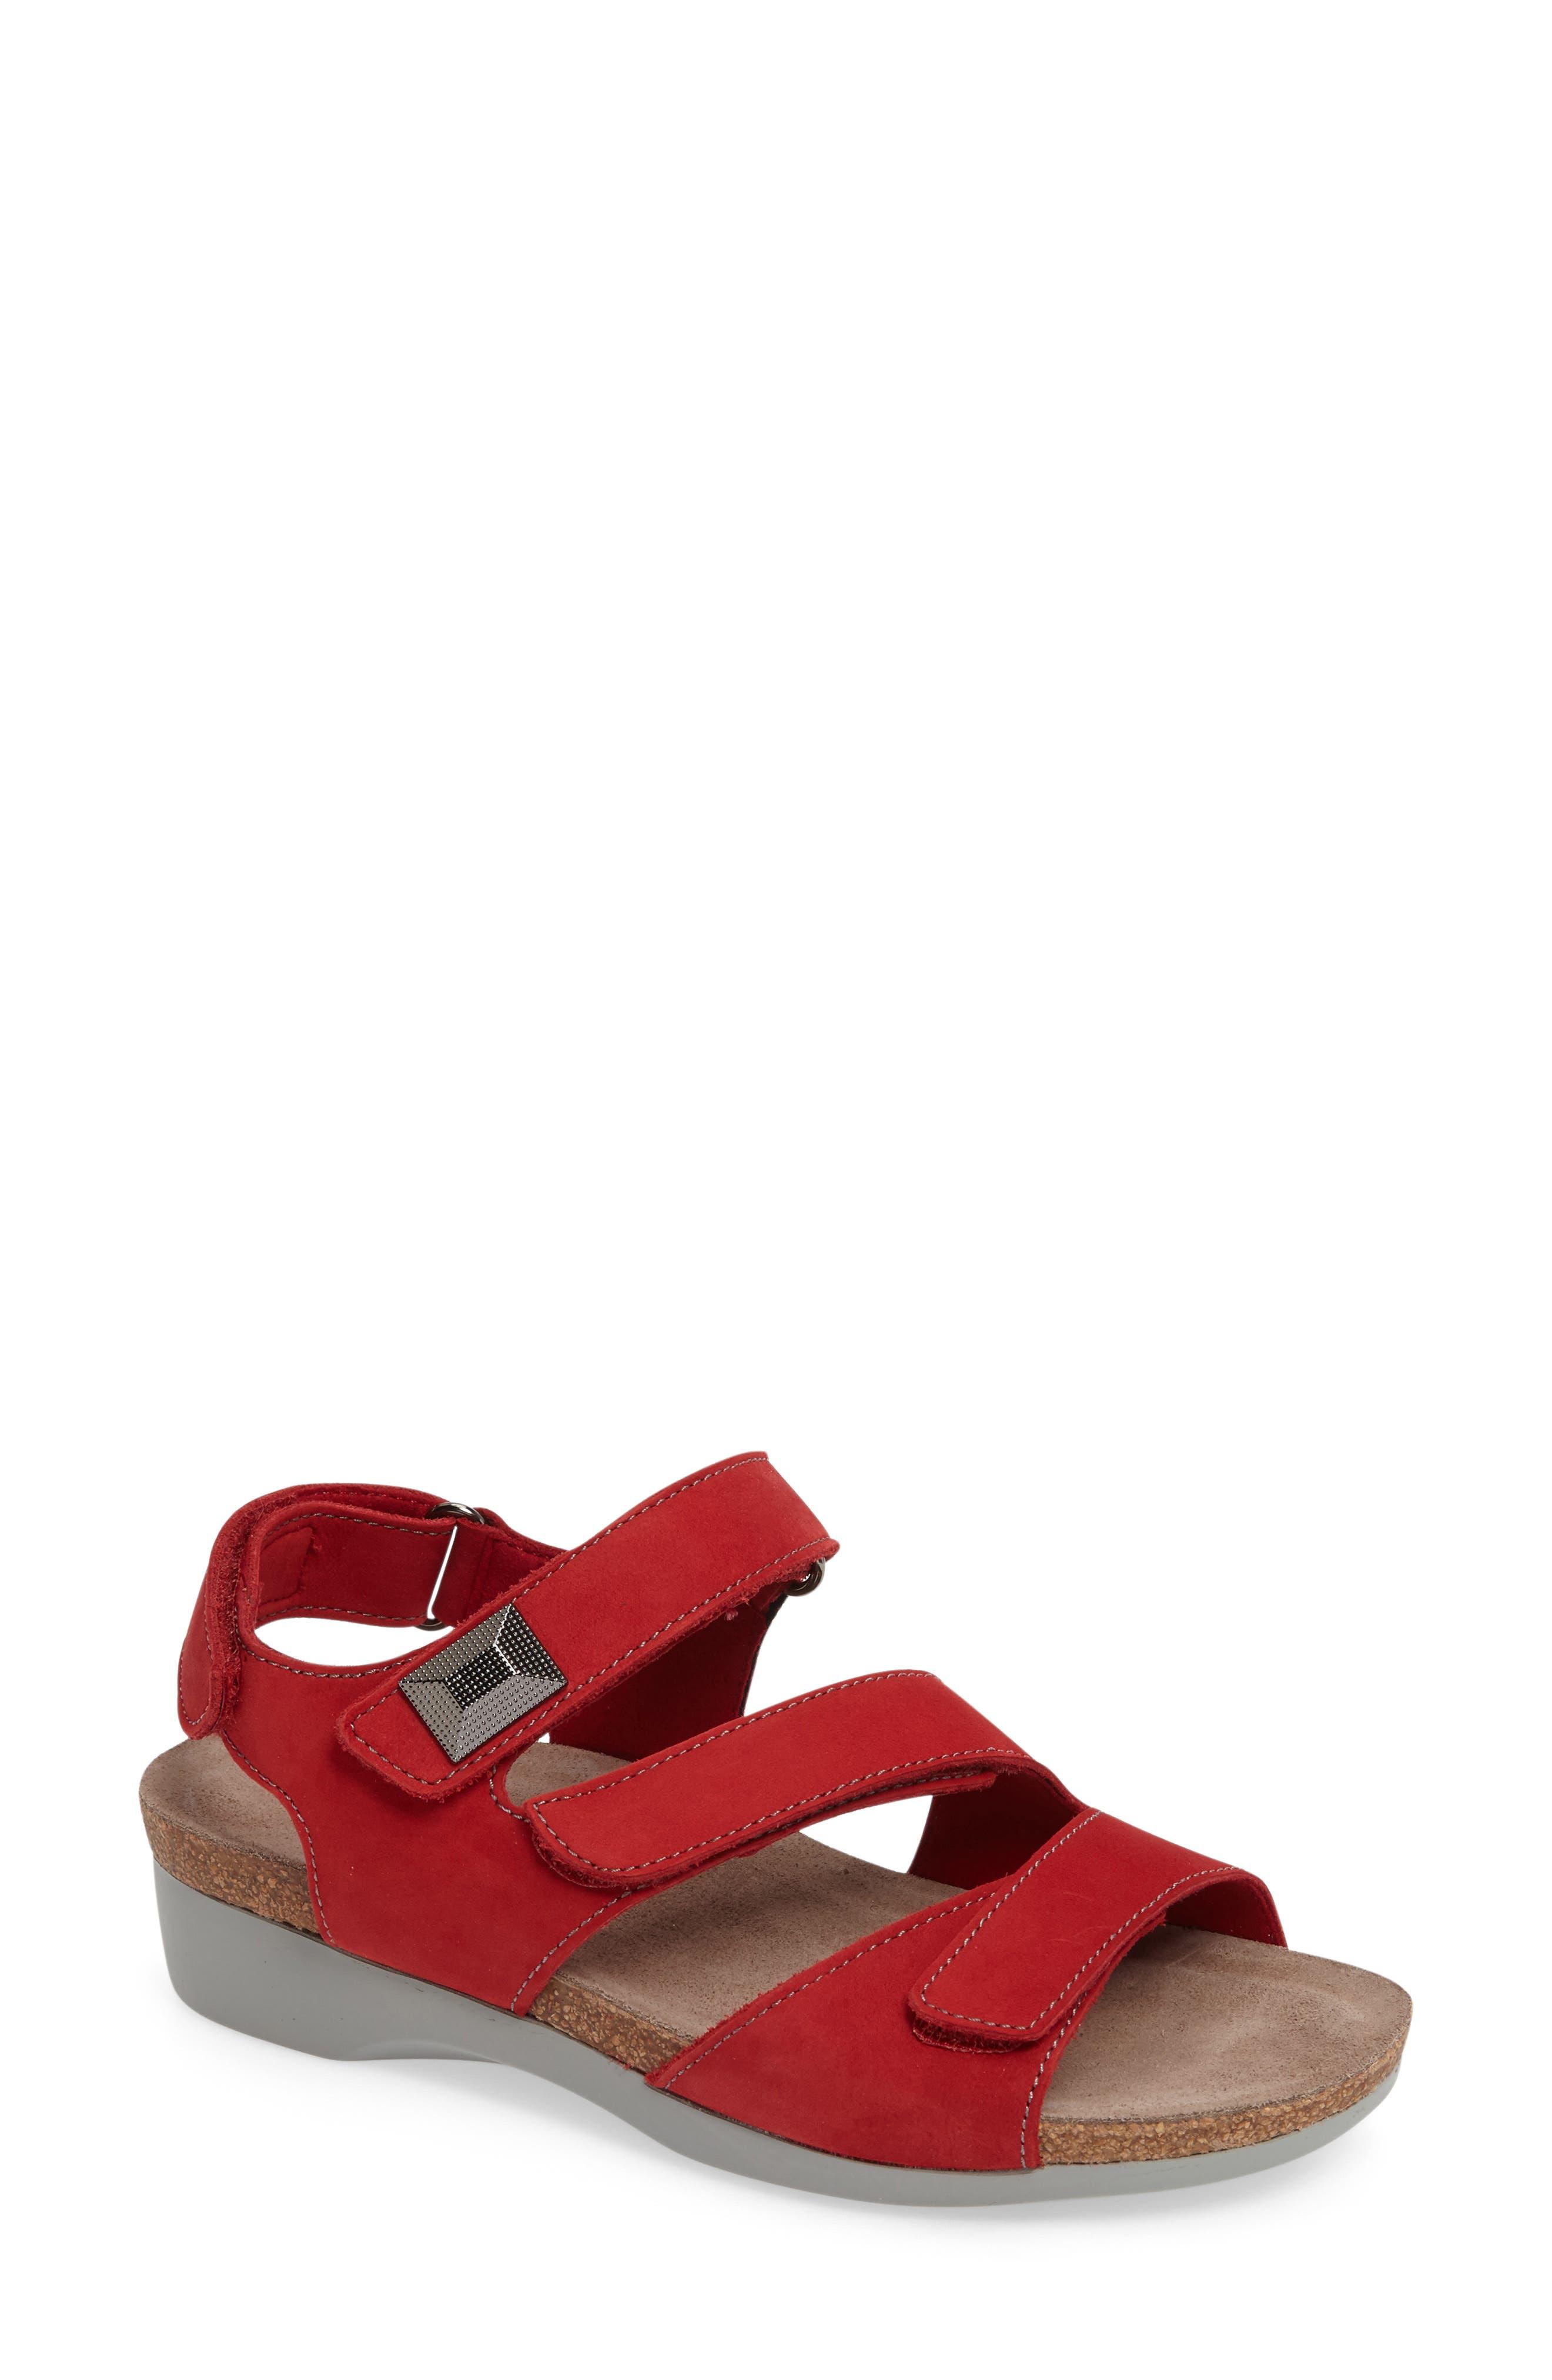 Antila Sandal,                         Main,                         color, Red